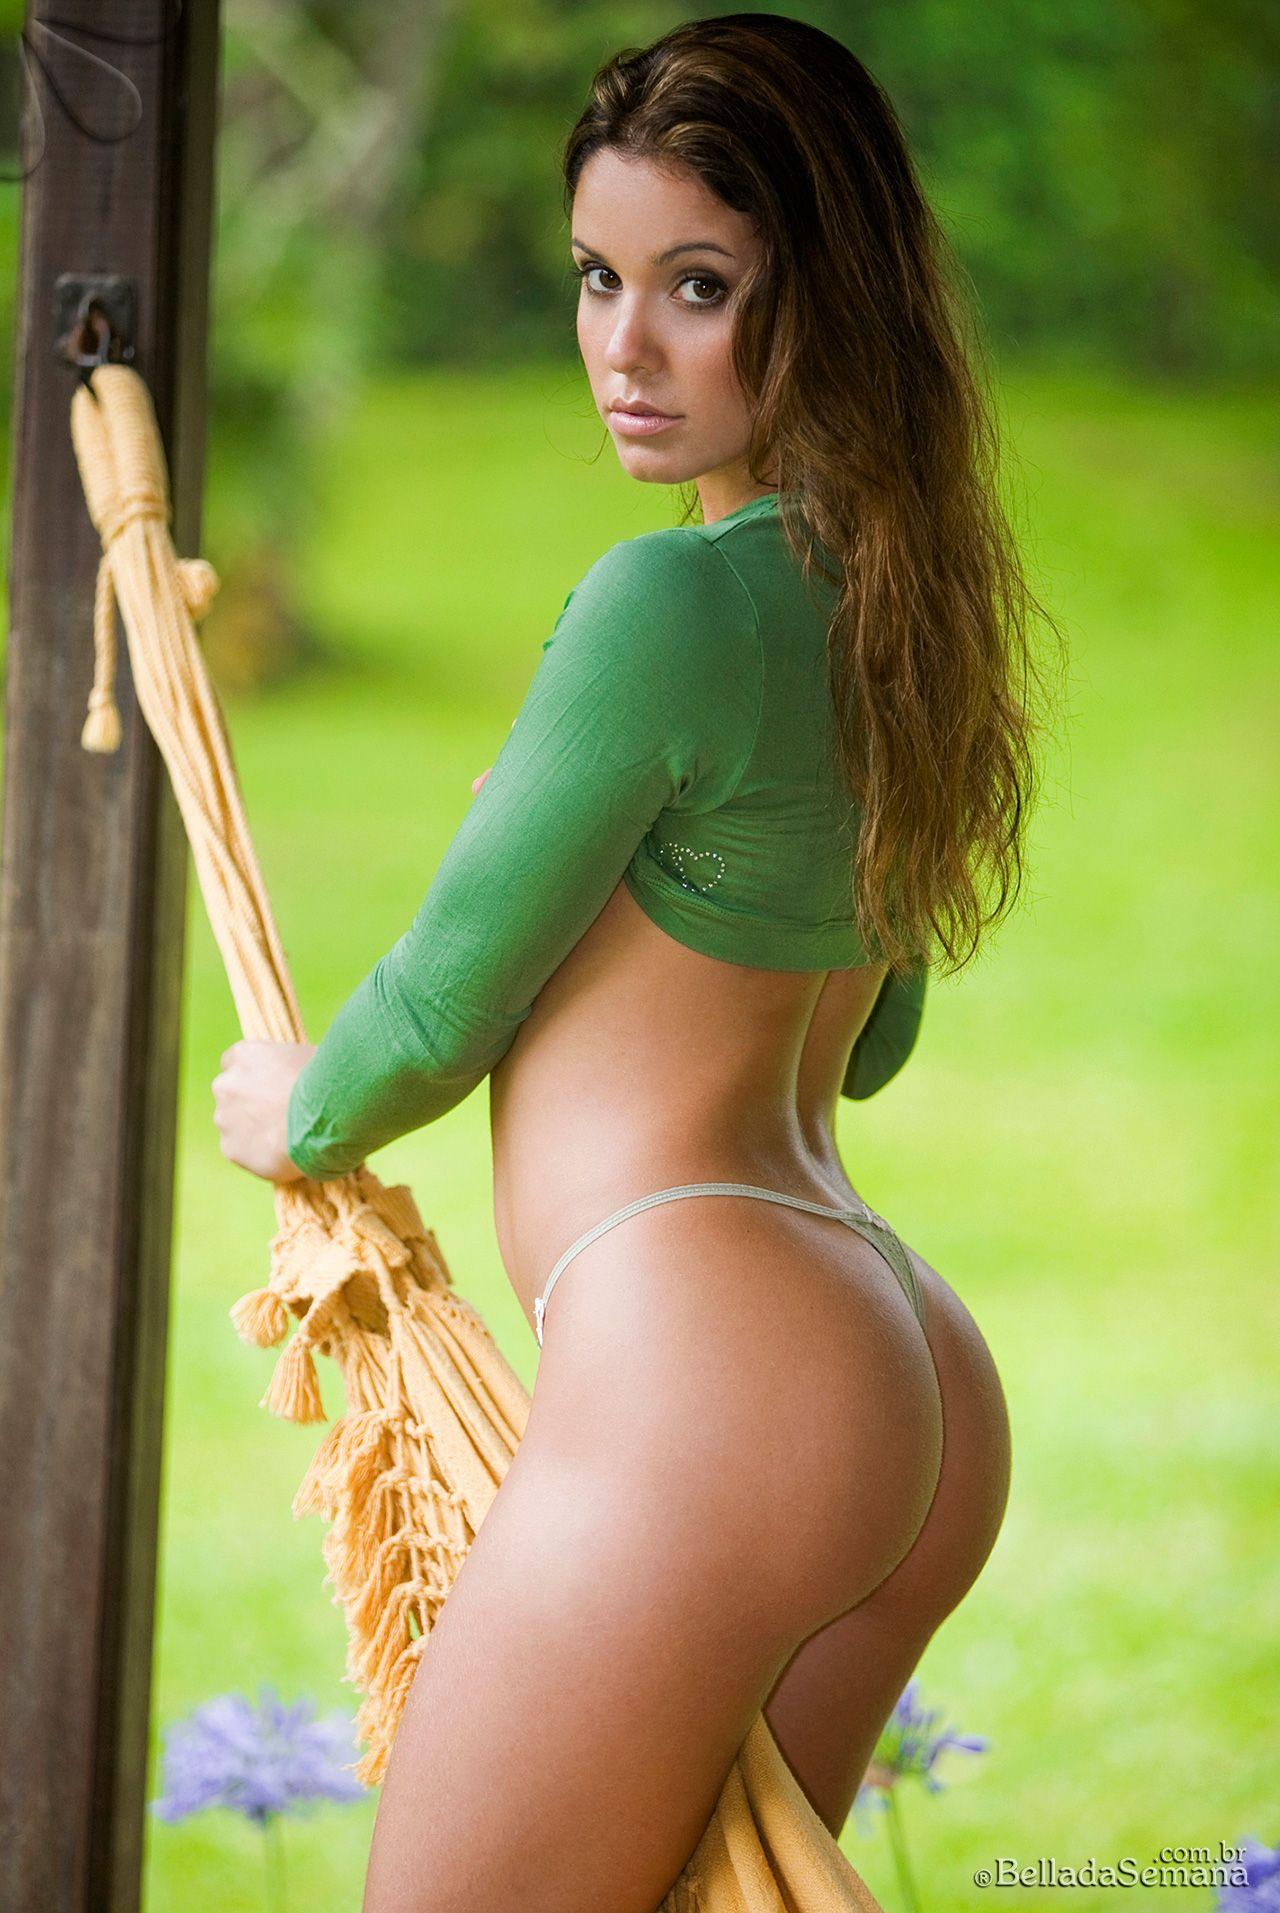 Nude Priyanka Gandhi Great marcella matos - fotos - modelos - bella da semana | sexiest girls